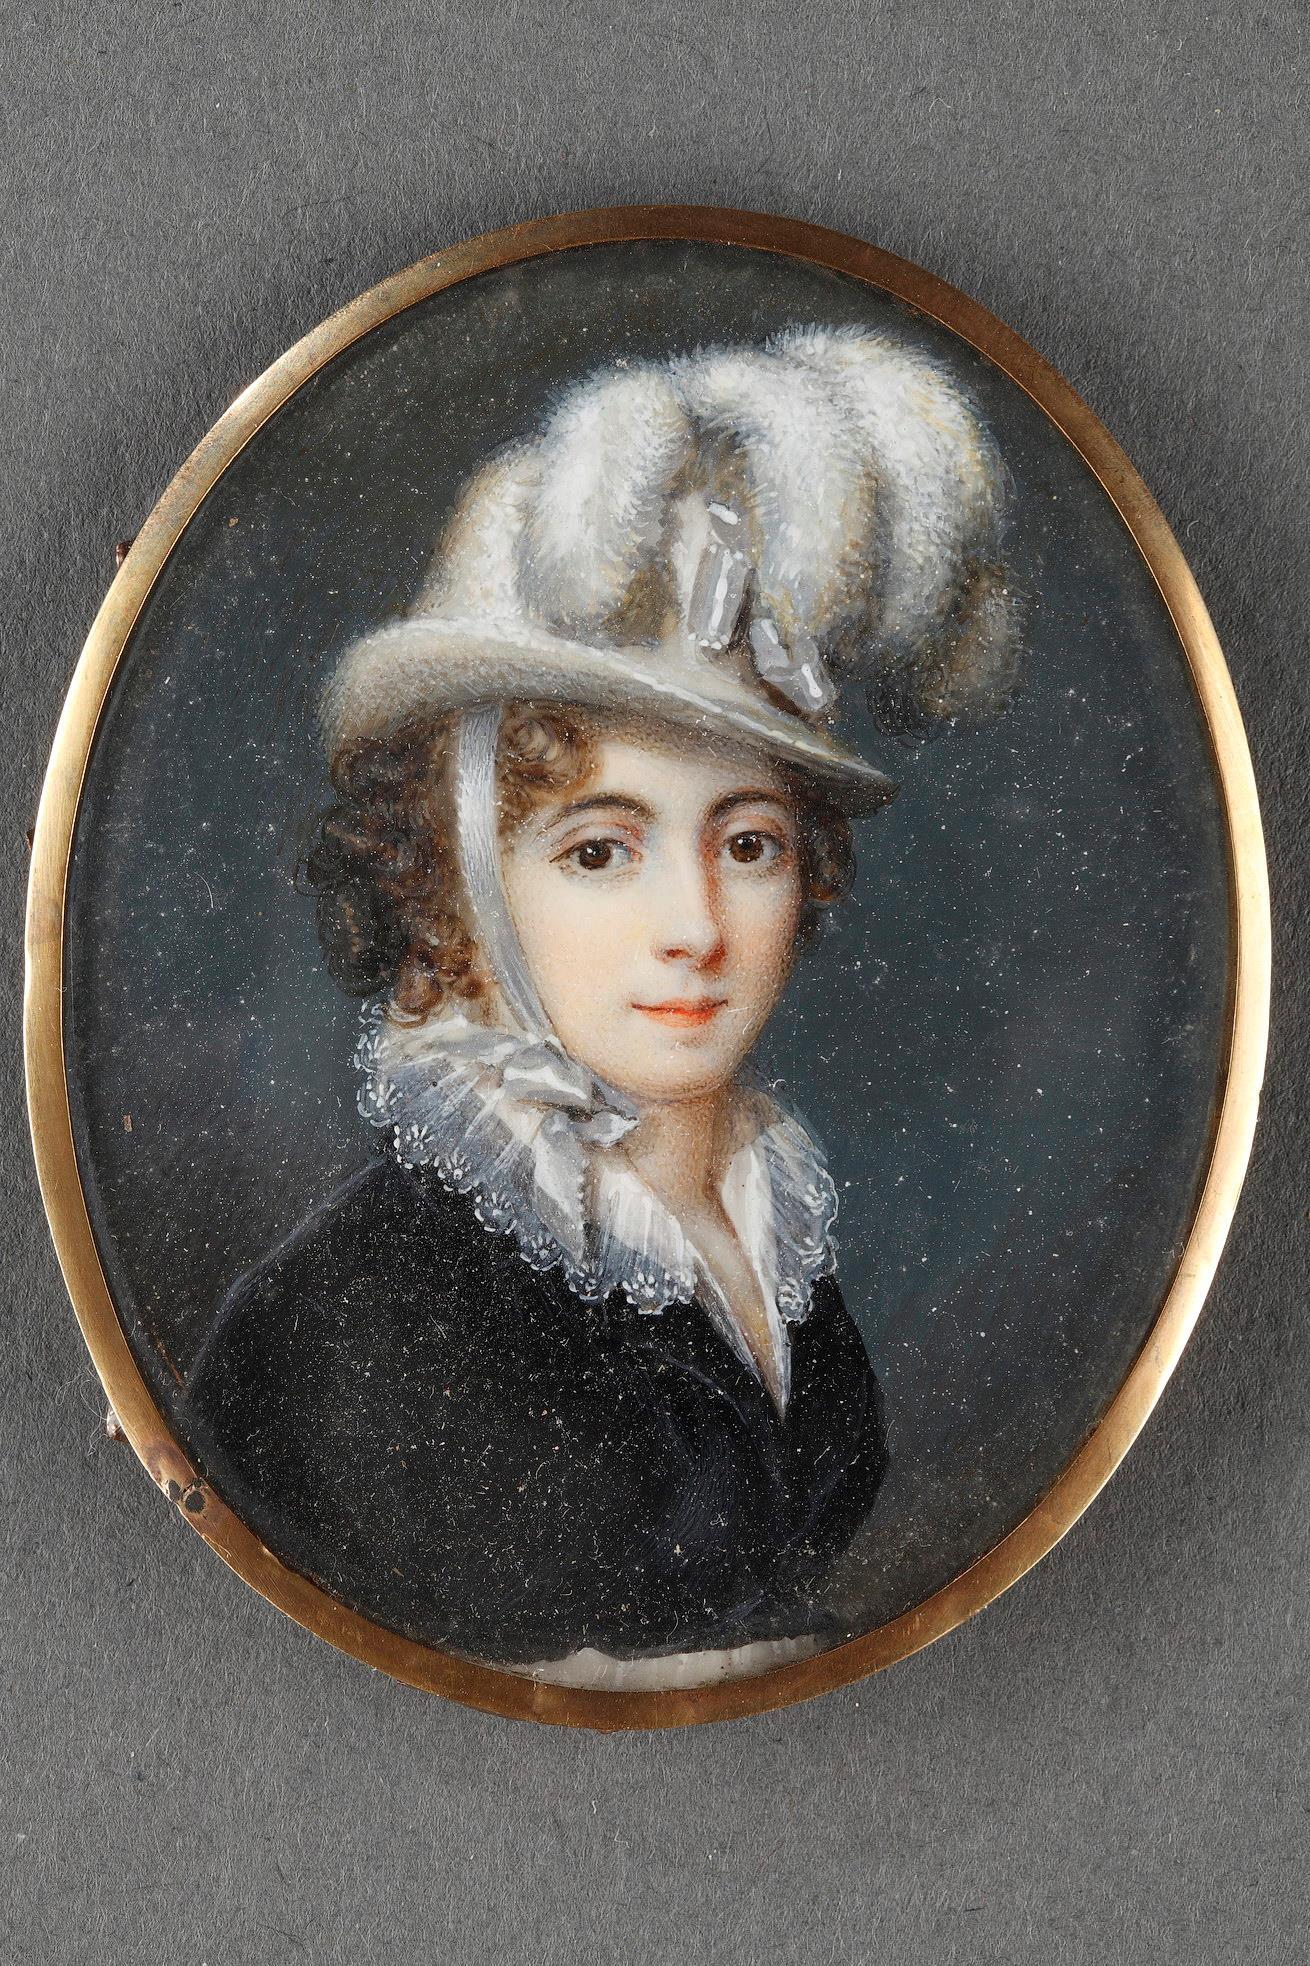 Early 19th century ivory portrait of the Baroness Davida Schickler.